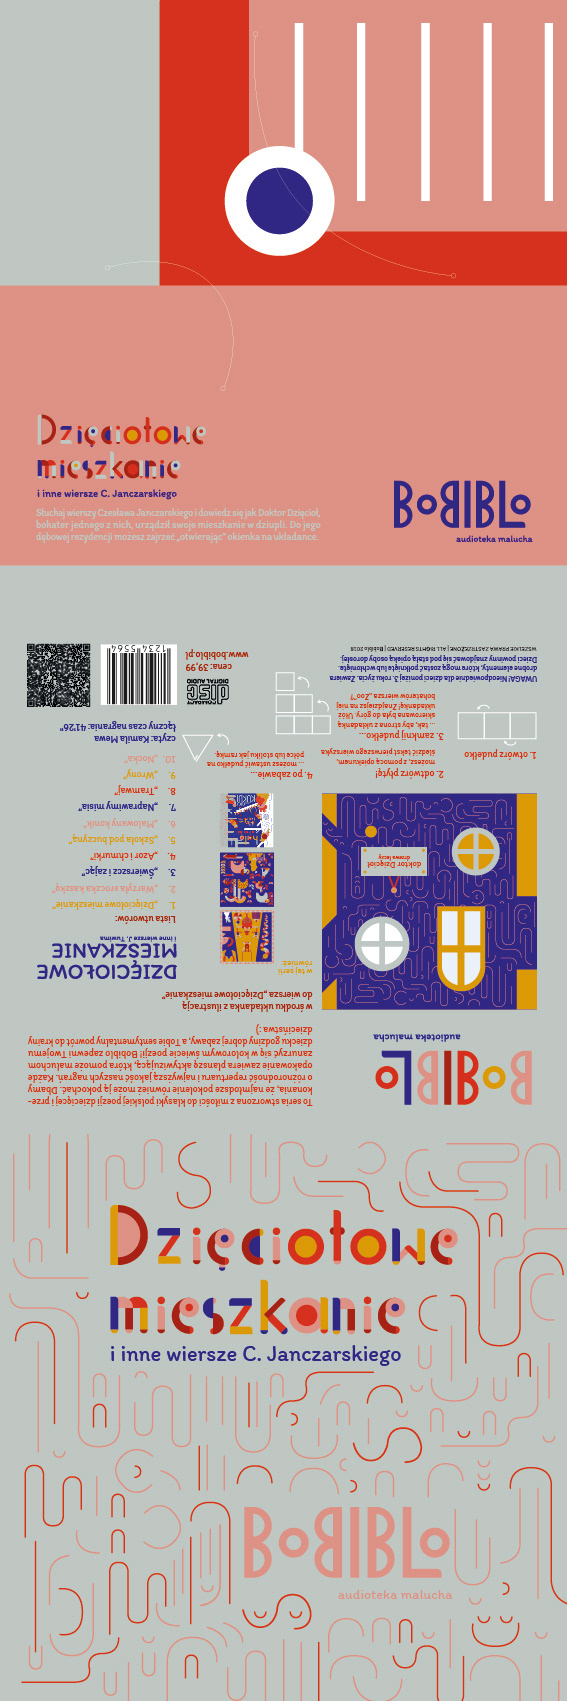 Bobiblo Packaging Design On Behance